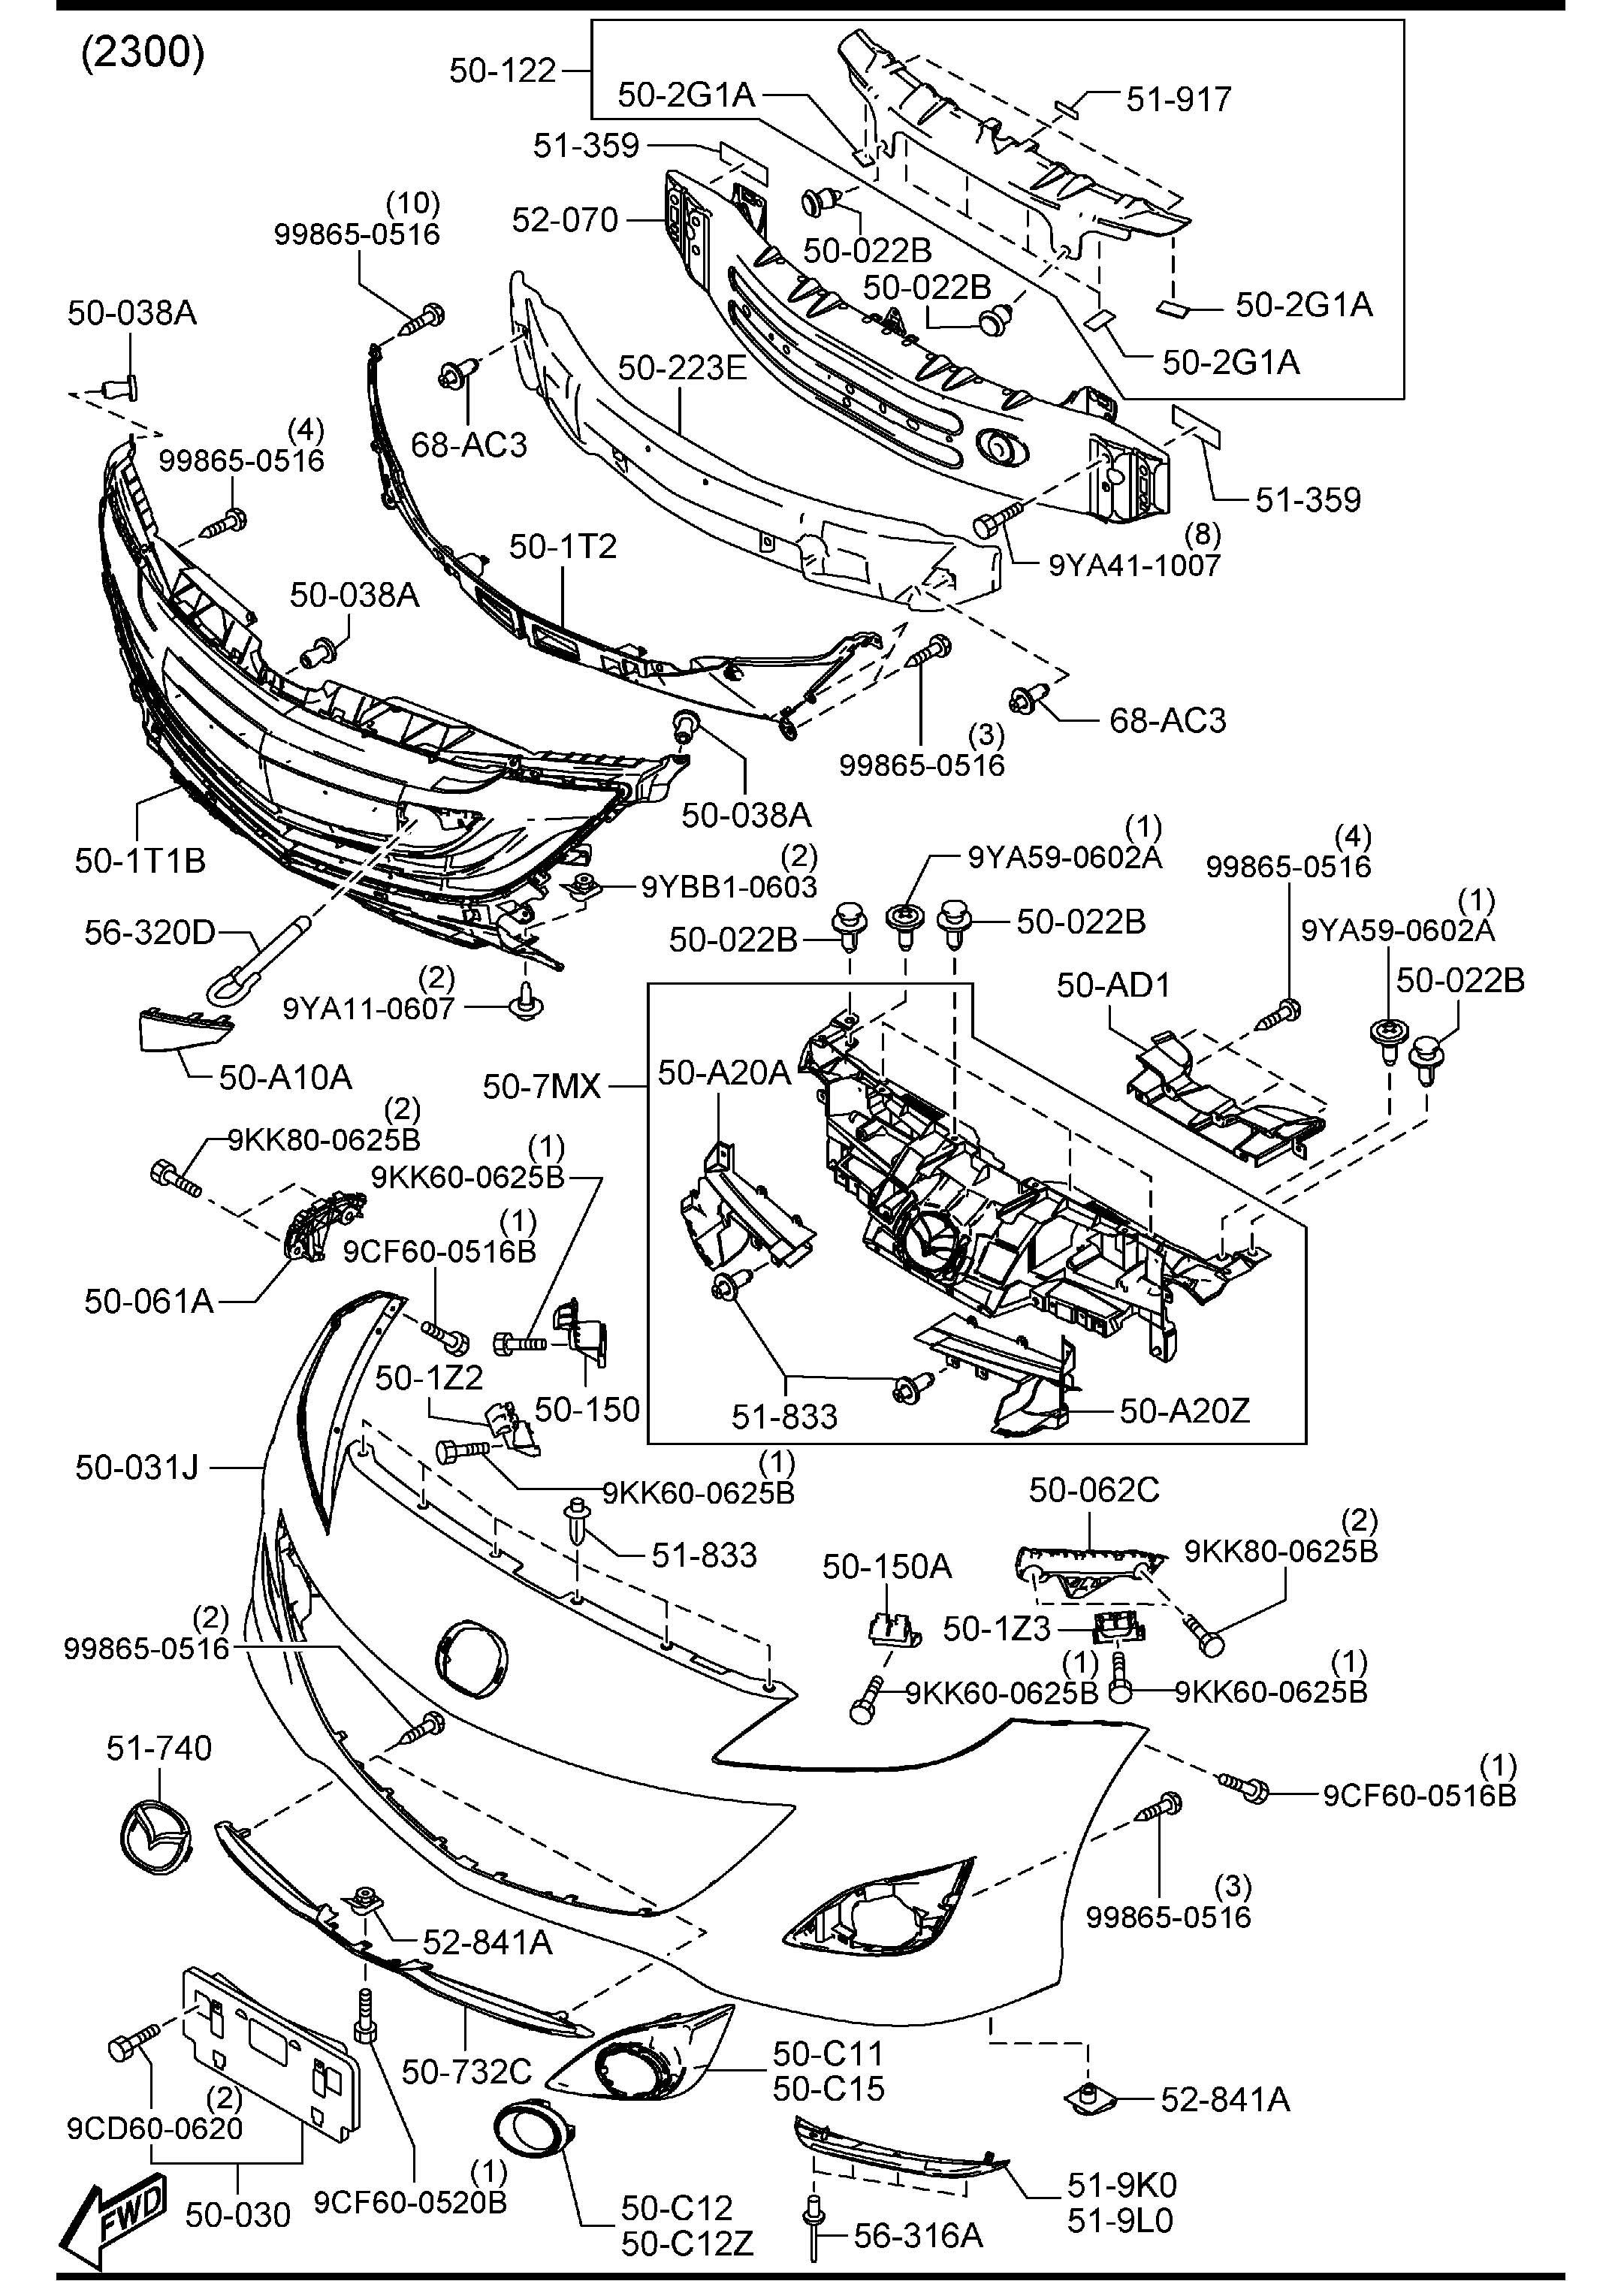 2009 mazda 6 parts diagram  u2022 wiring diagram for free